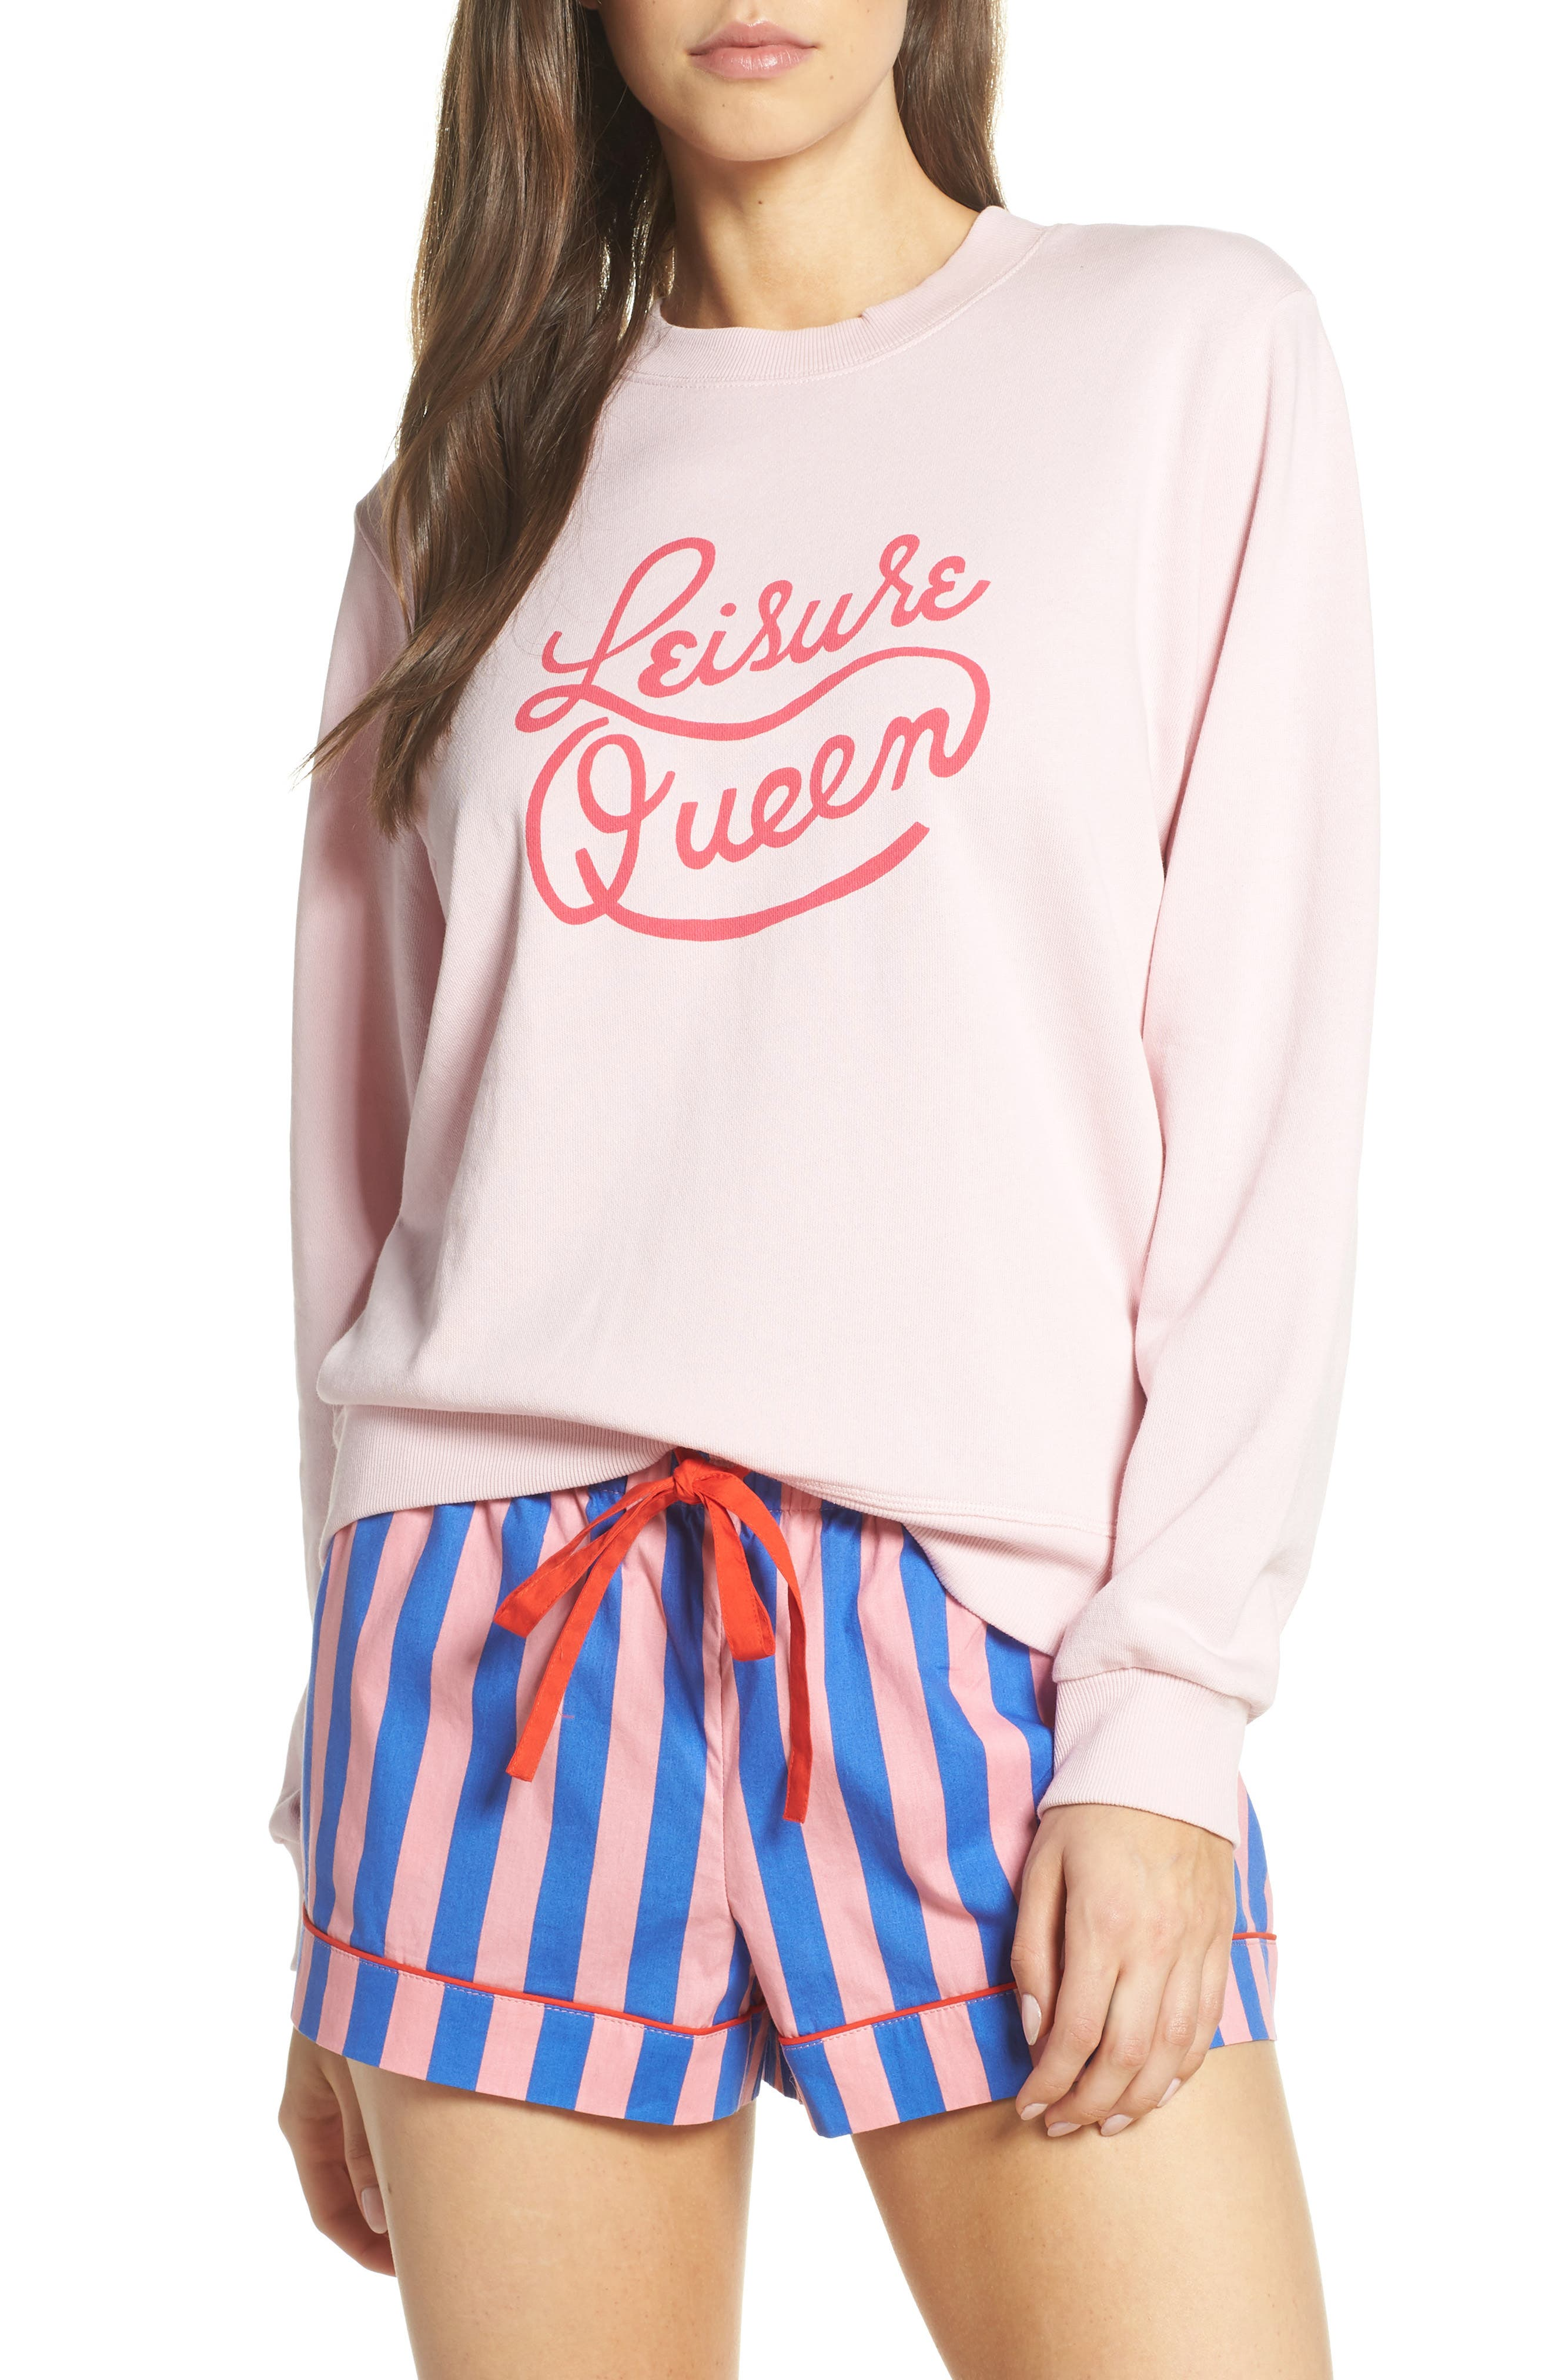 BAN.DO Leisure Queen Sweatshirt, Main, color, PINK